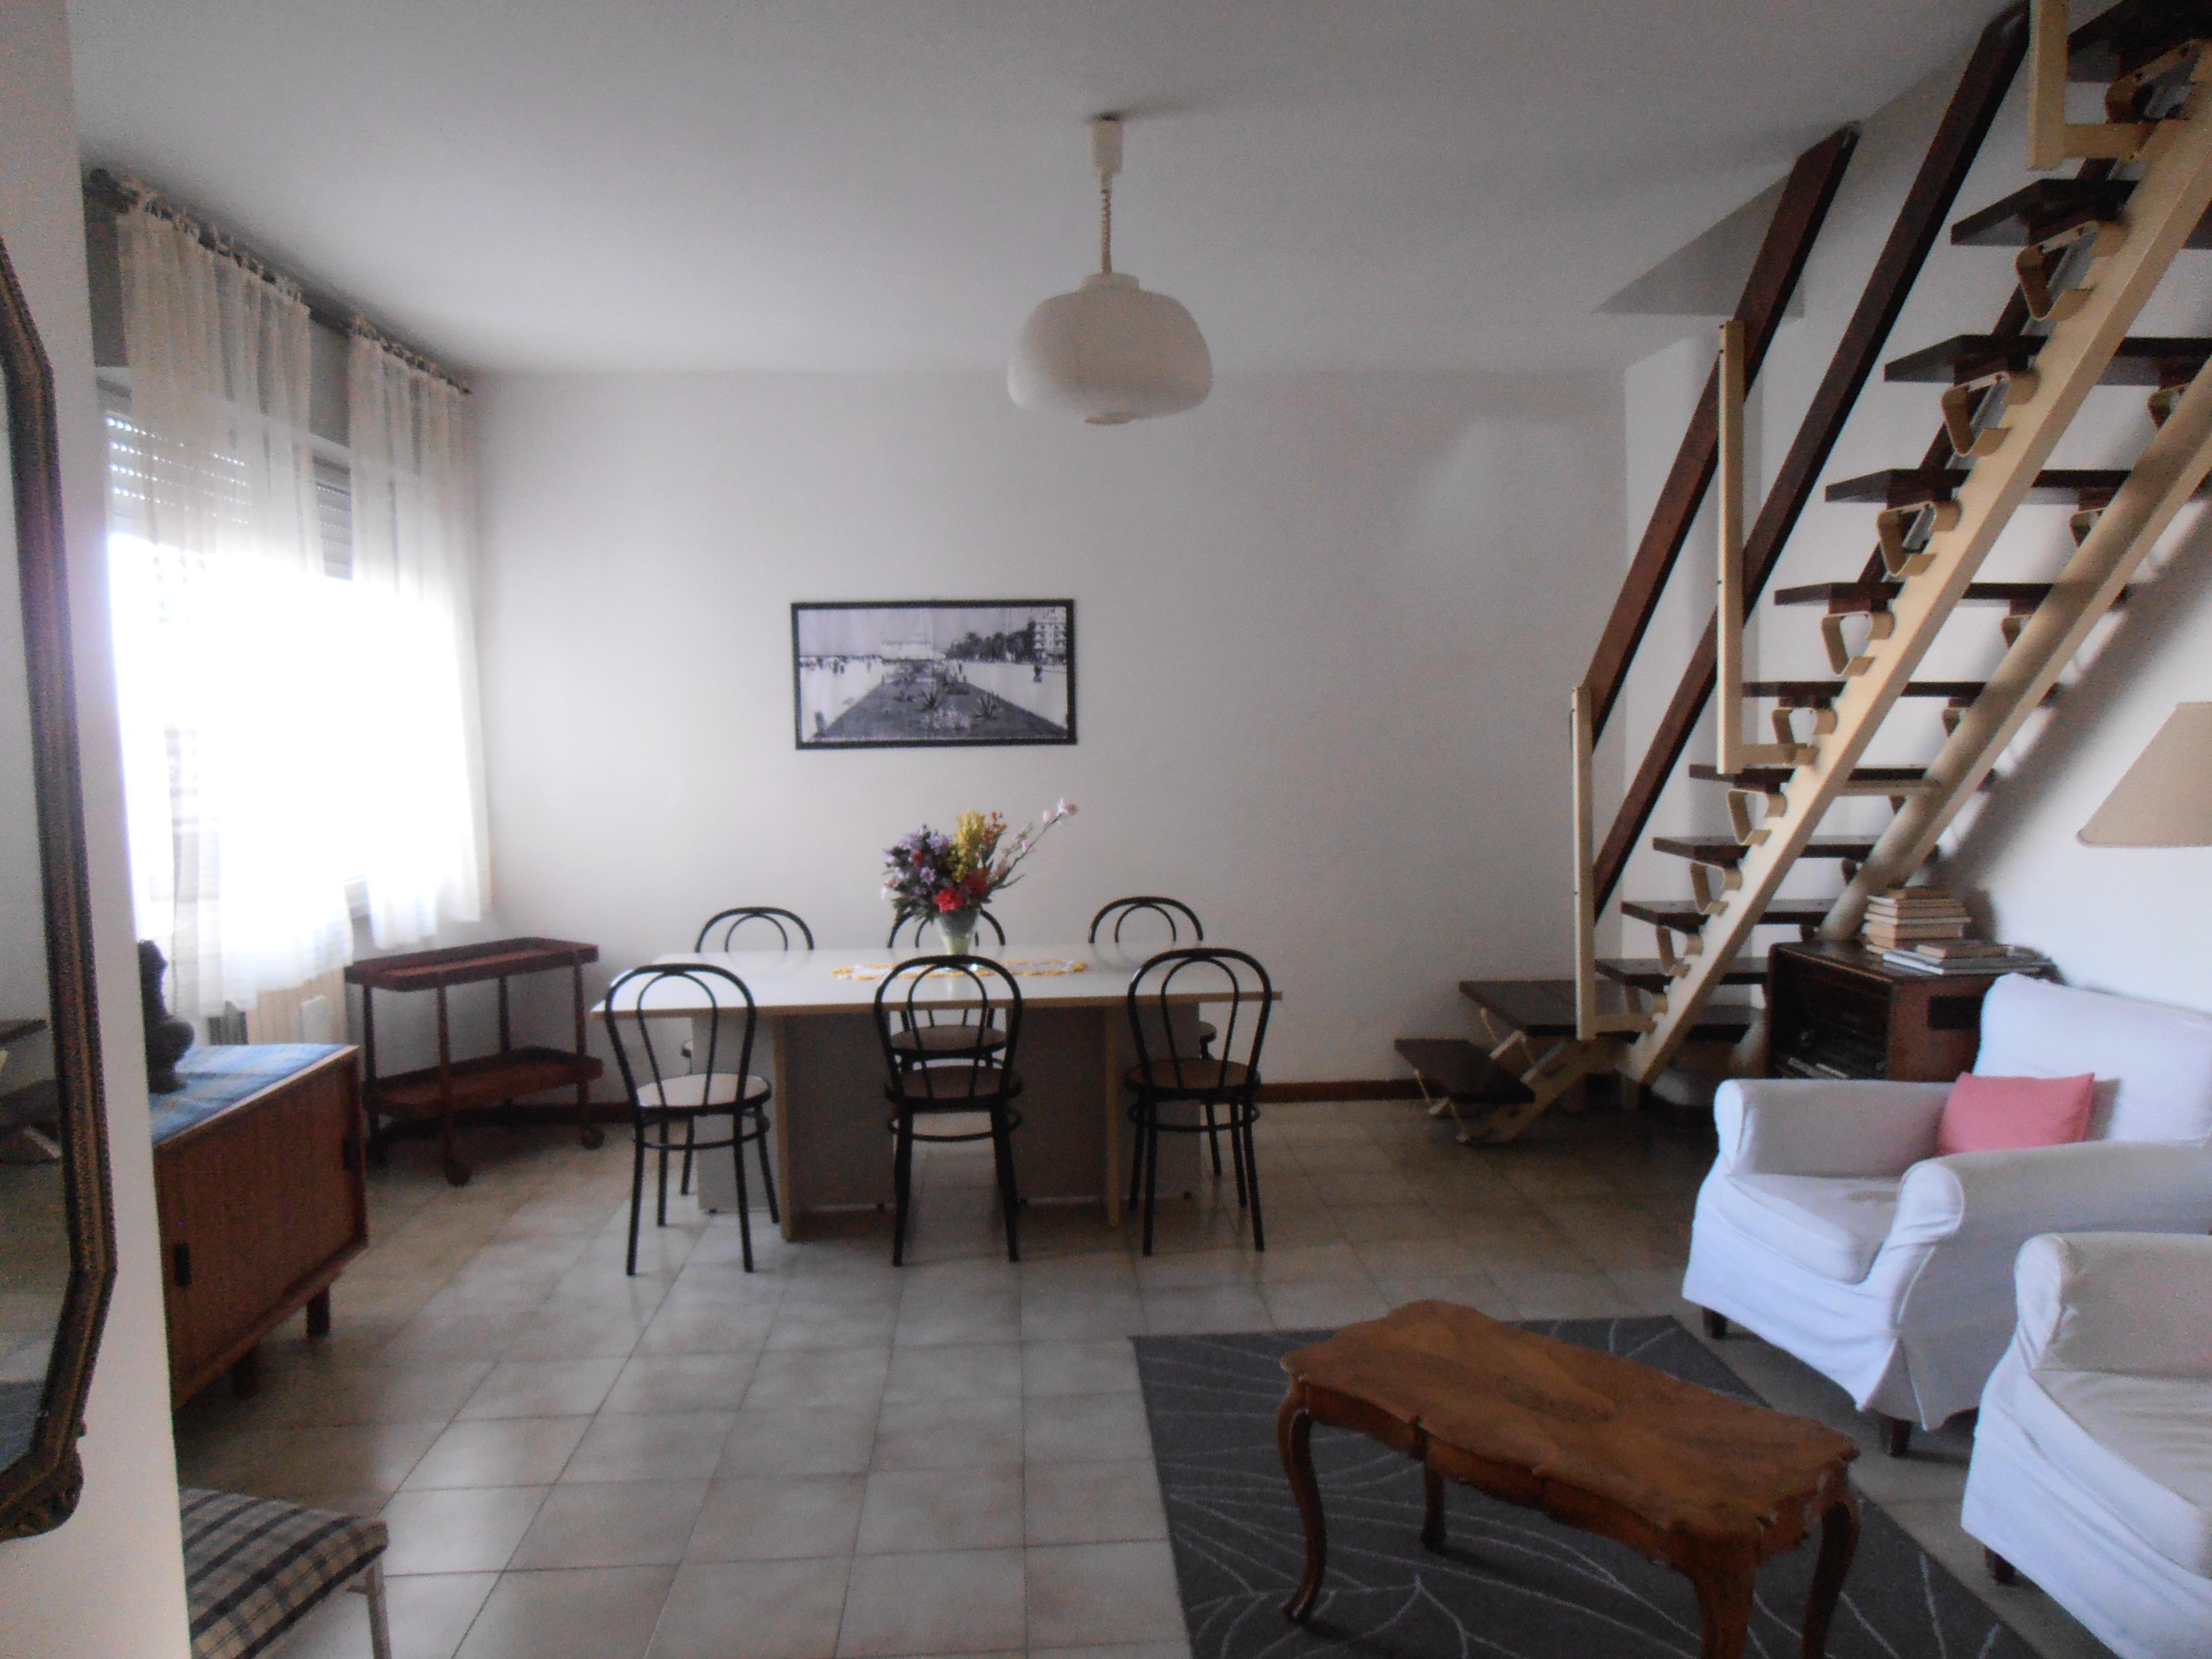 24192_Viareggio centro_Viareggio_Vendita_Appartamento